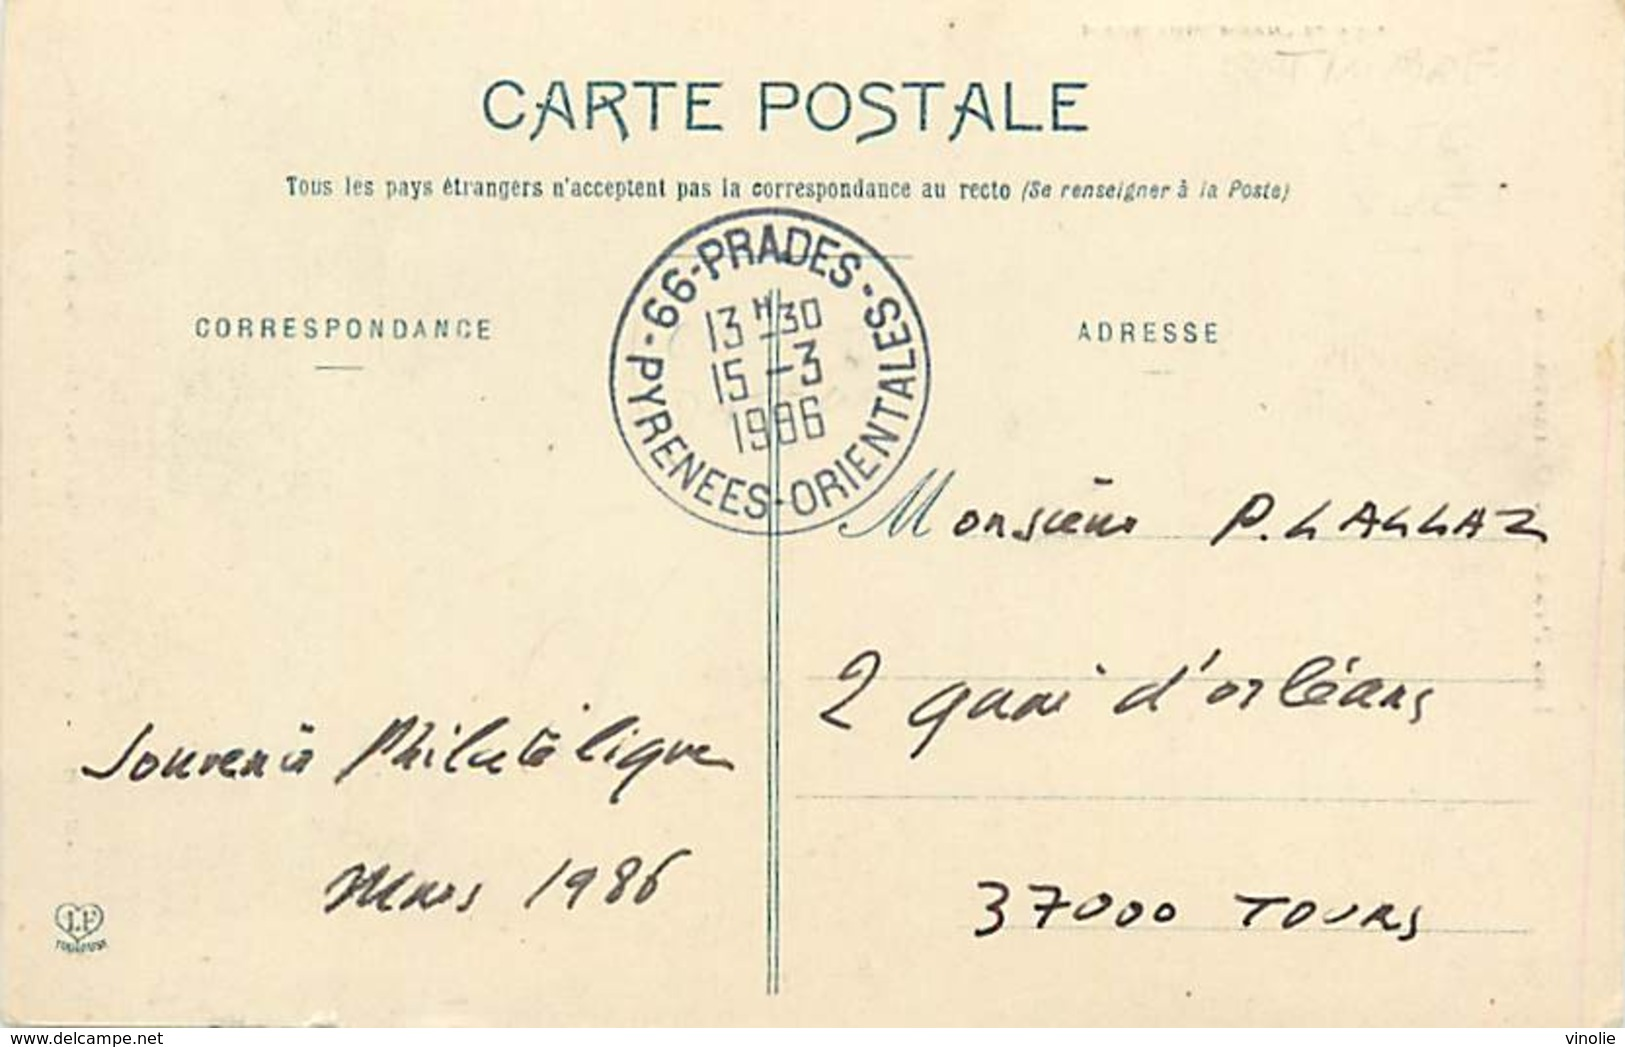 A-17 5108 : SAINT-MICHEL-DE-CUXA PRES PRADES PYRENNEES-ORIENTALES 15 MARS 1896 - Cartes-Maximum